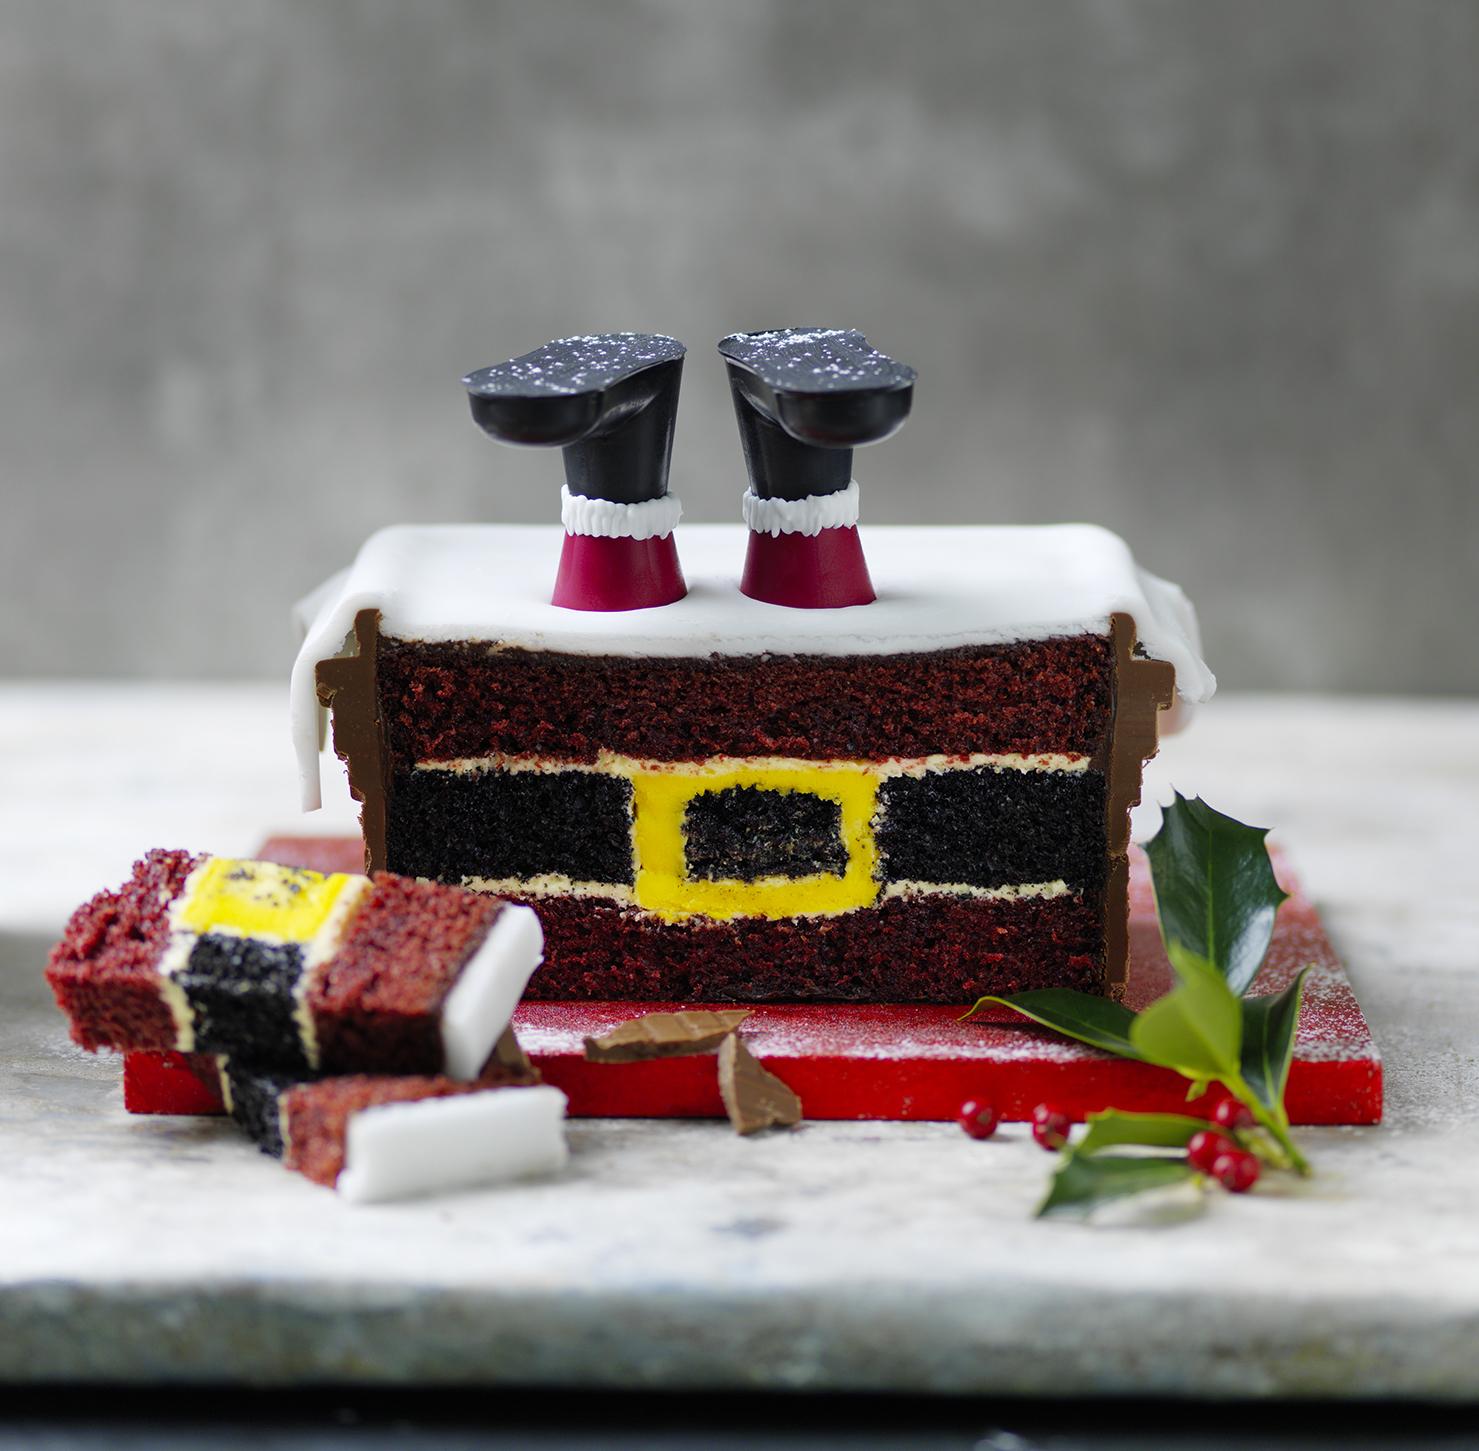 santa s stuck in the chimney is marks and spencer 39 s best. Black Bedroom Furniture Sets. Home Design Ideas